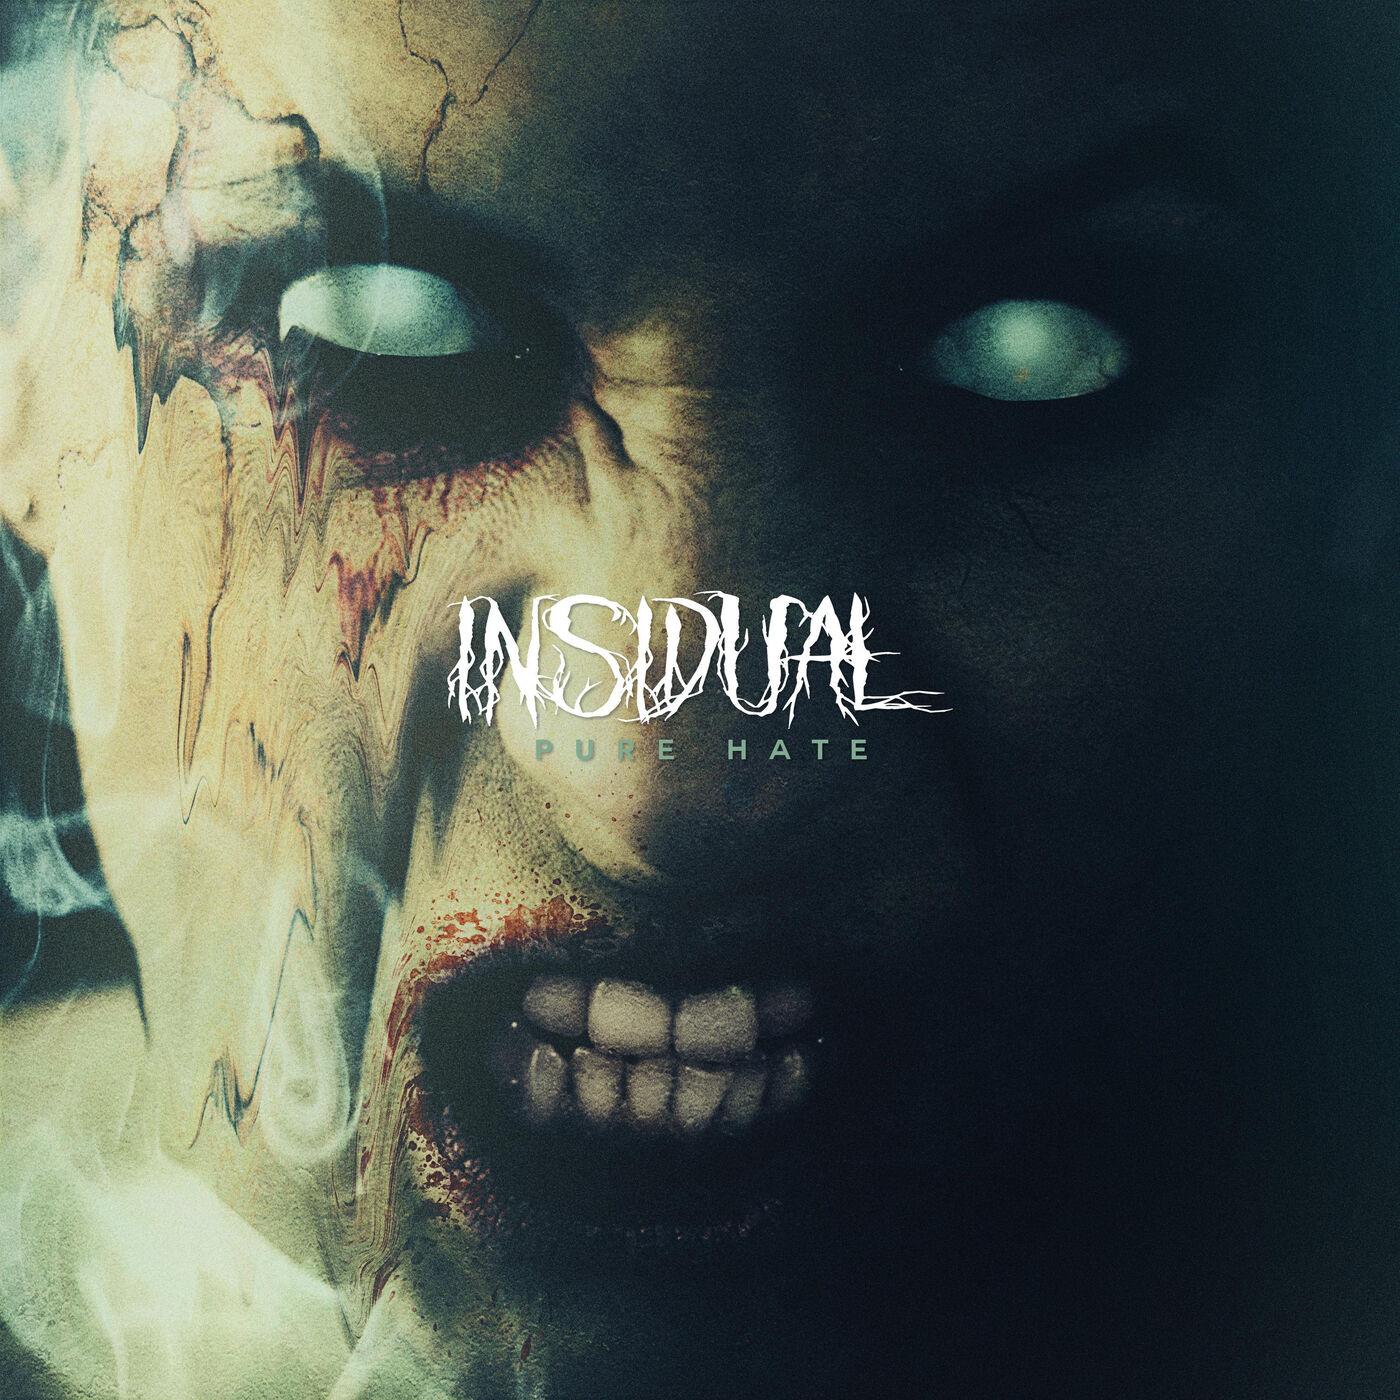 Insidual - Pure Hate [EP] (2020)